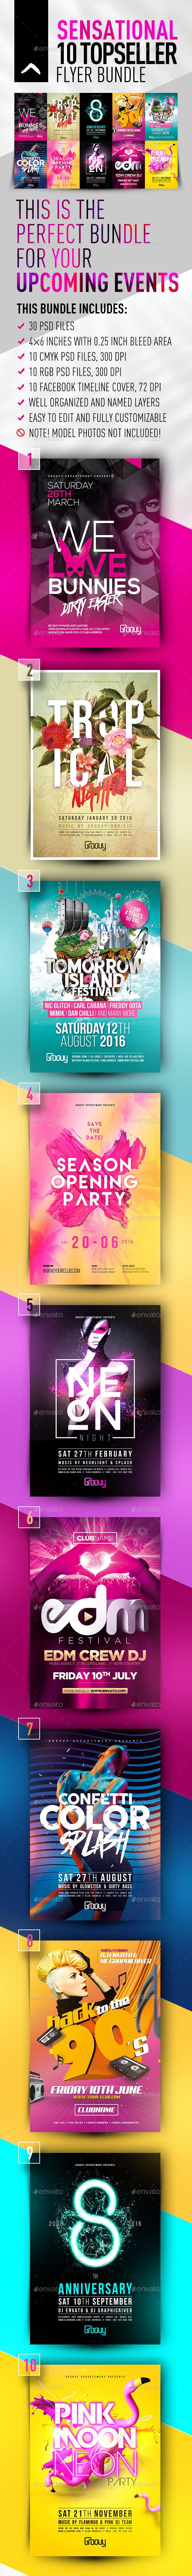 10 Topseller Flyer Bundle - Clubs & Parties Events